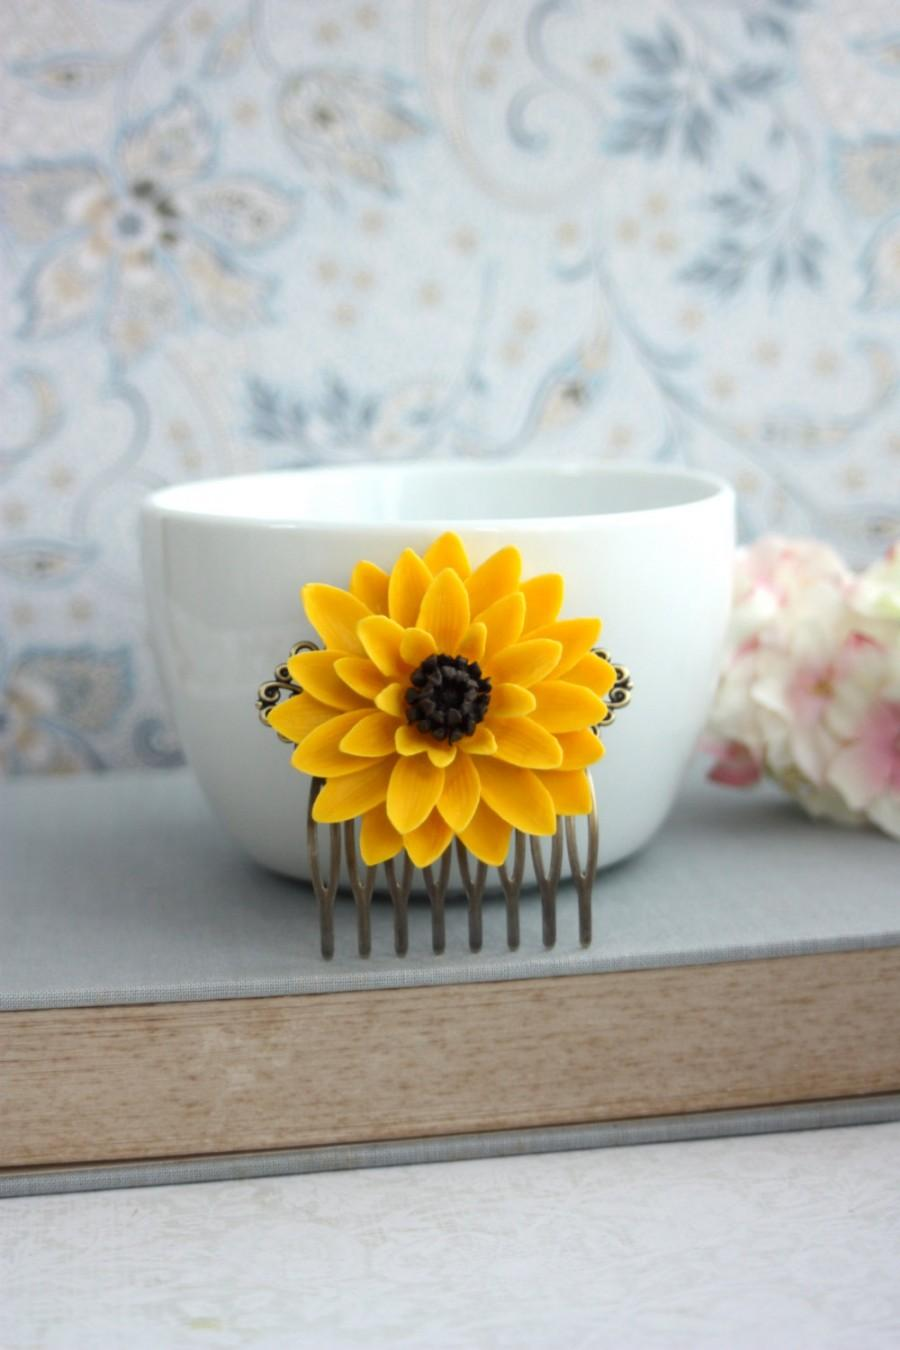 Свадьба - Sunflower Wedding. Yellow Sun Flower Floral Comb. Large Chrysanthemum Mum Flower, Statement Comb. Bridesmaids Gift, Yellow Summer Wedding